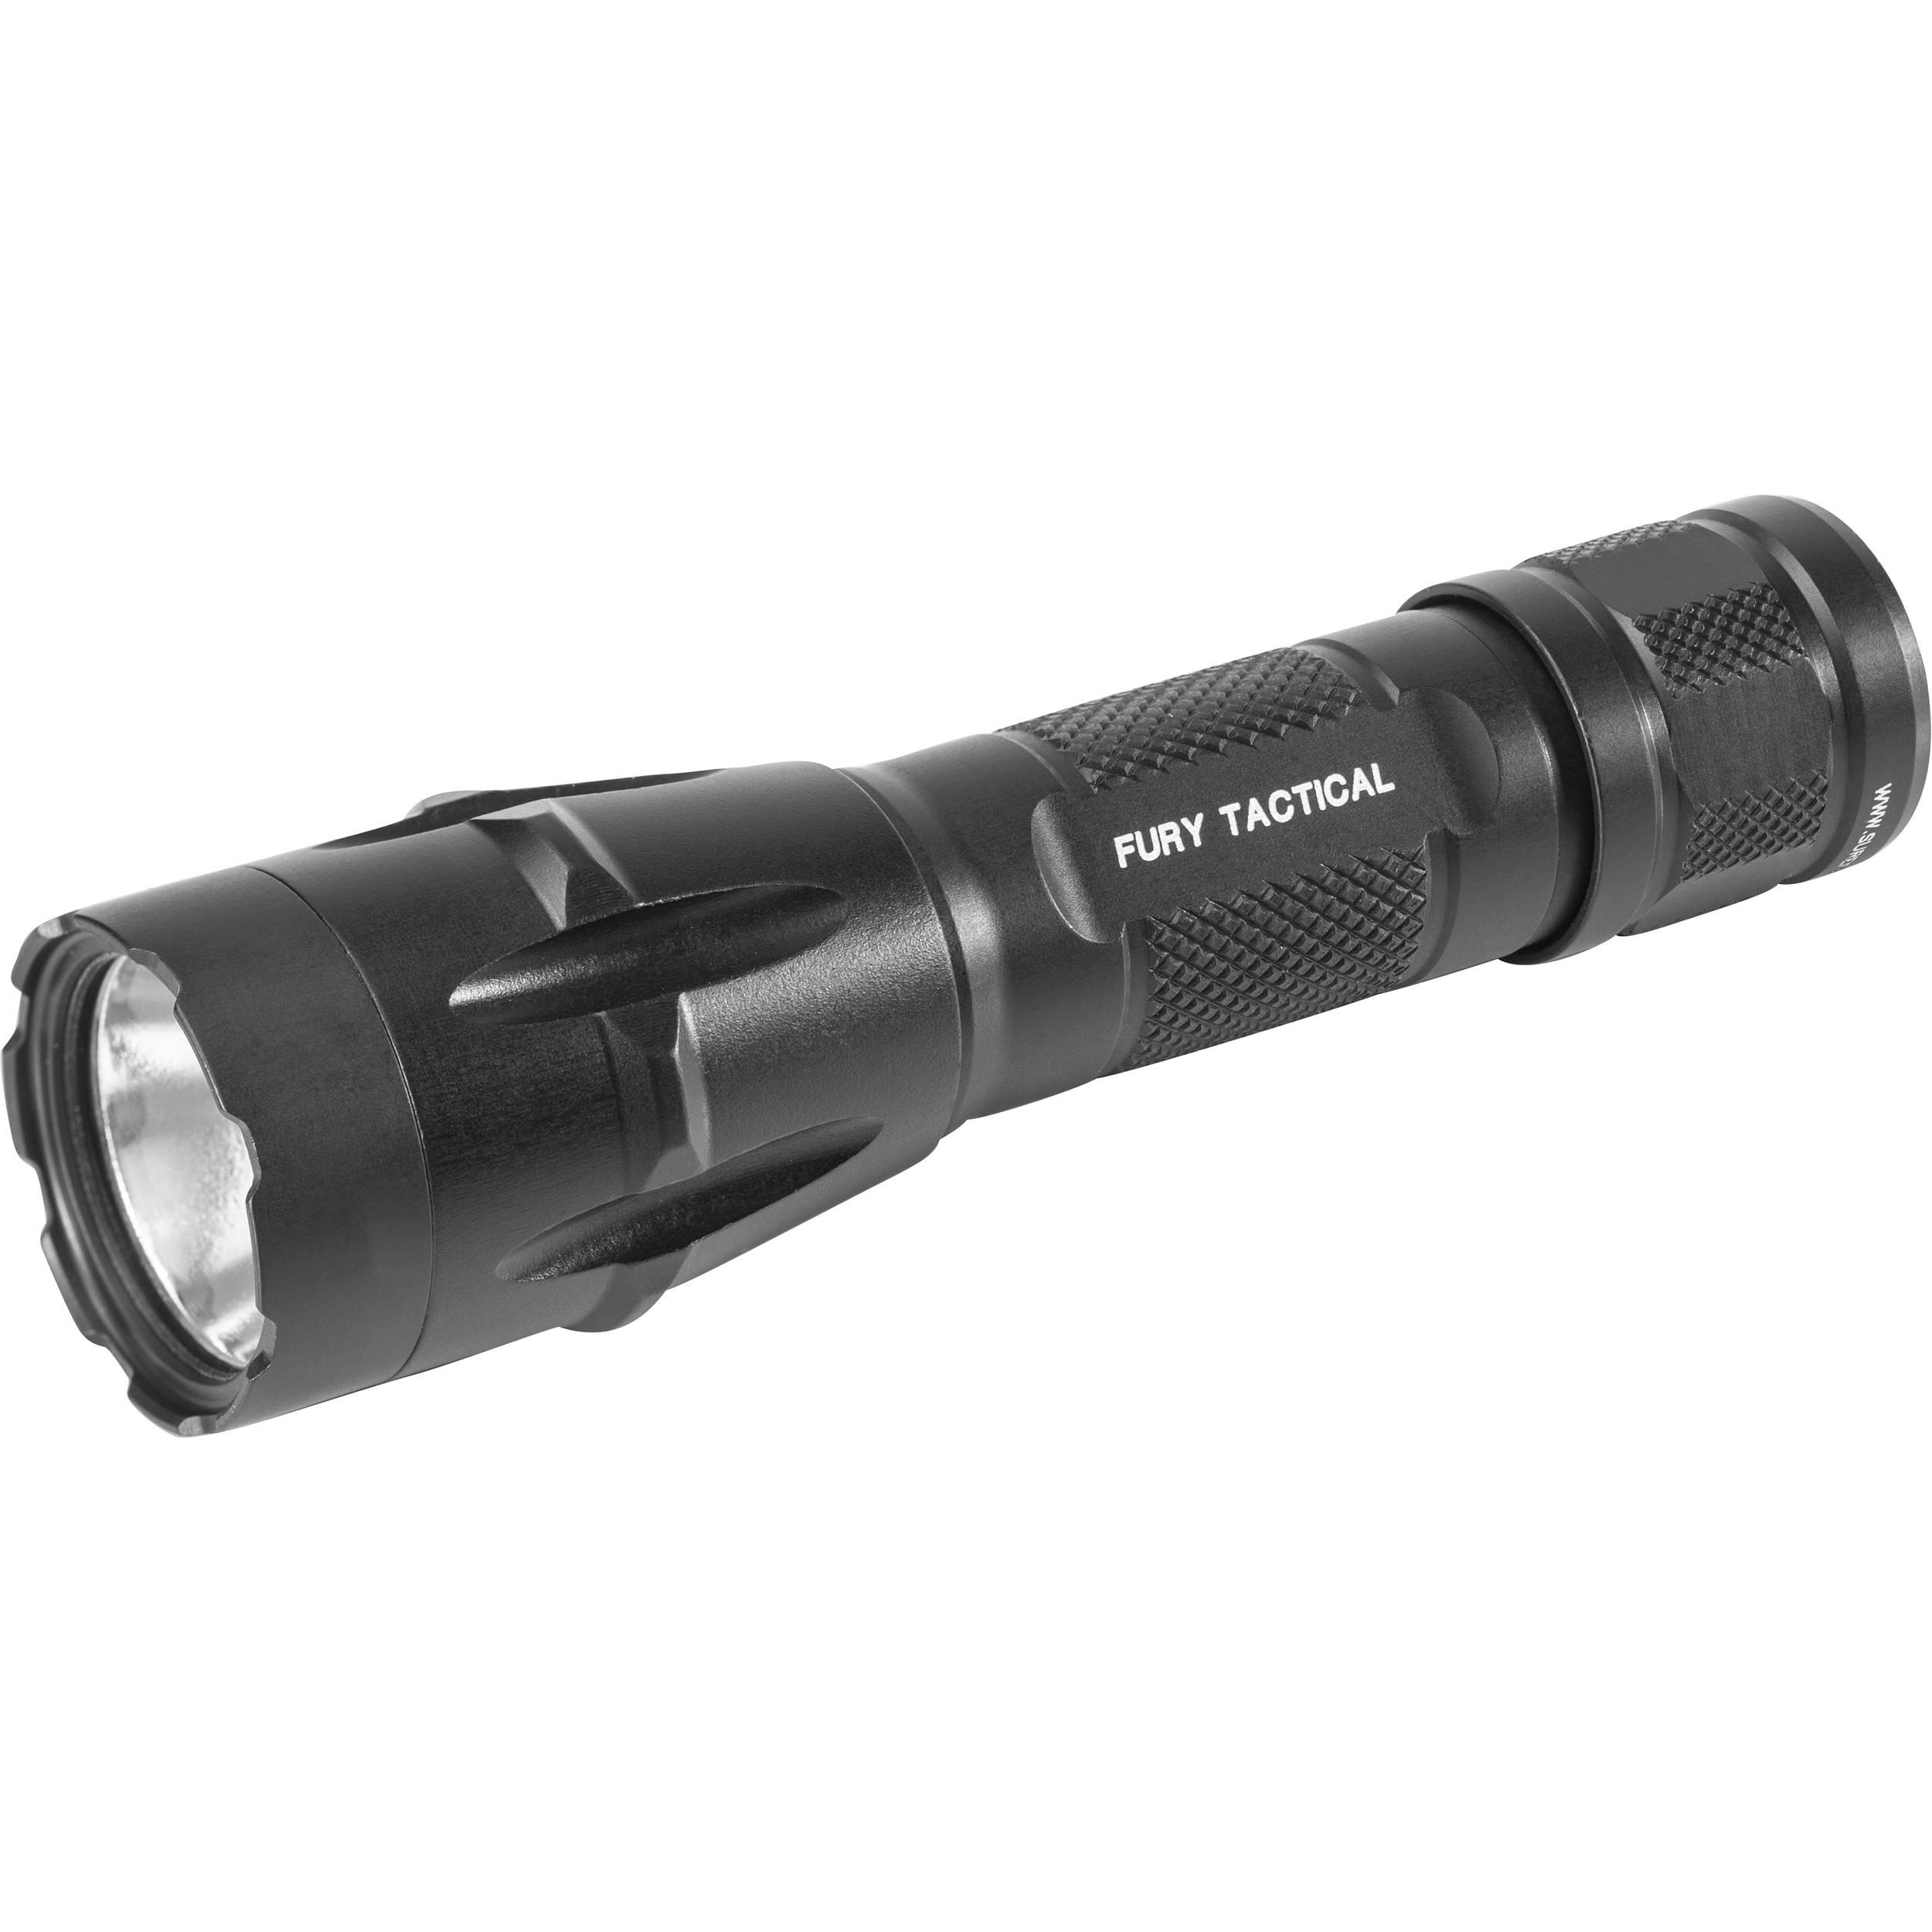 SureFire Fury Dual-Fuel Tactical LED Flashlight